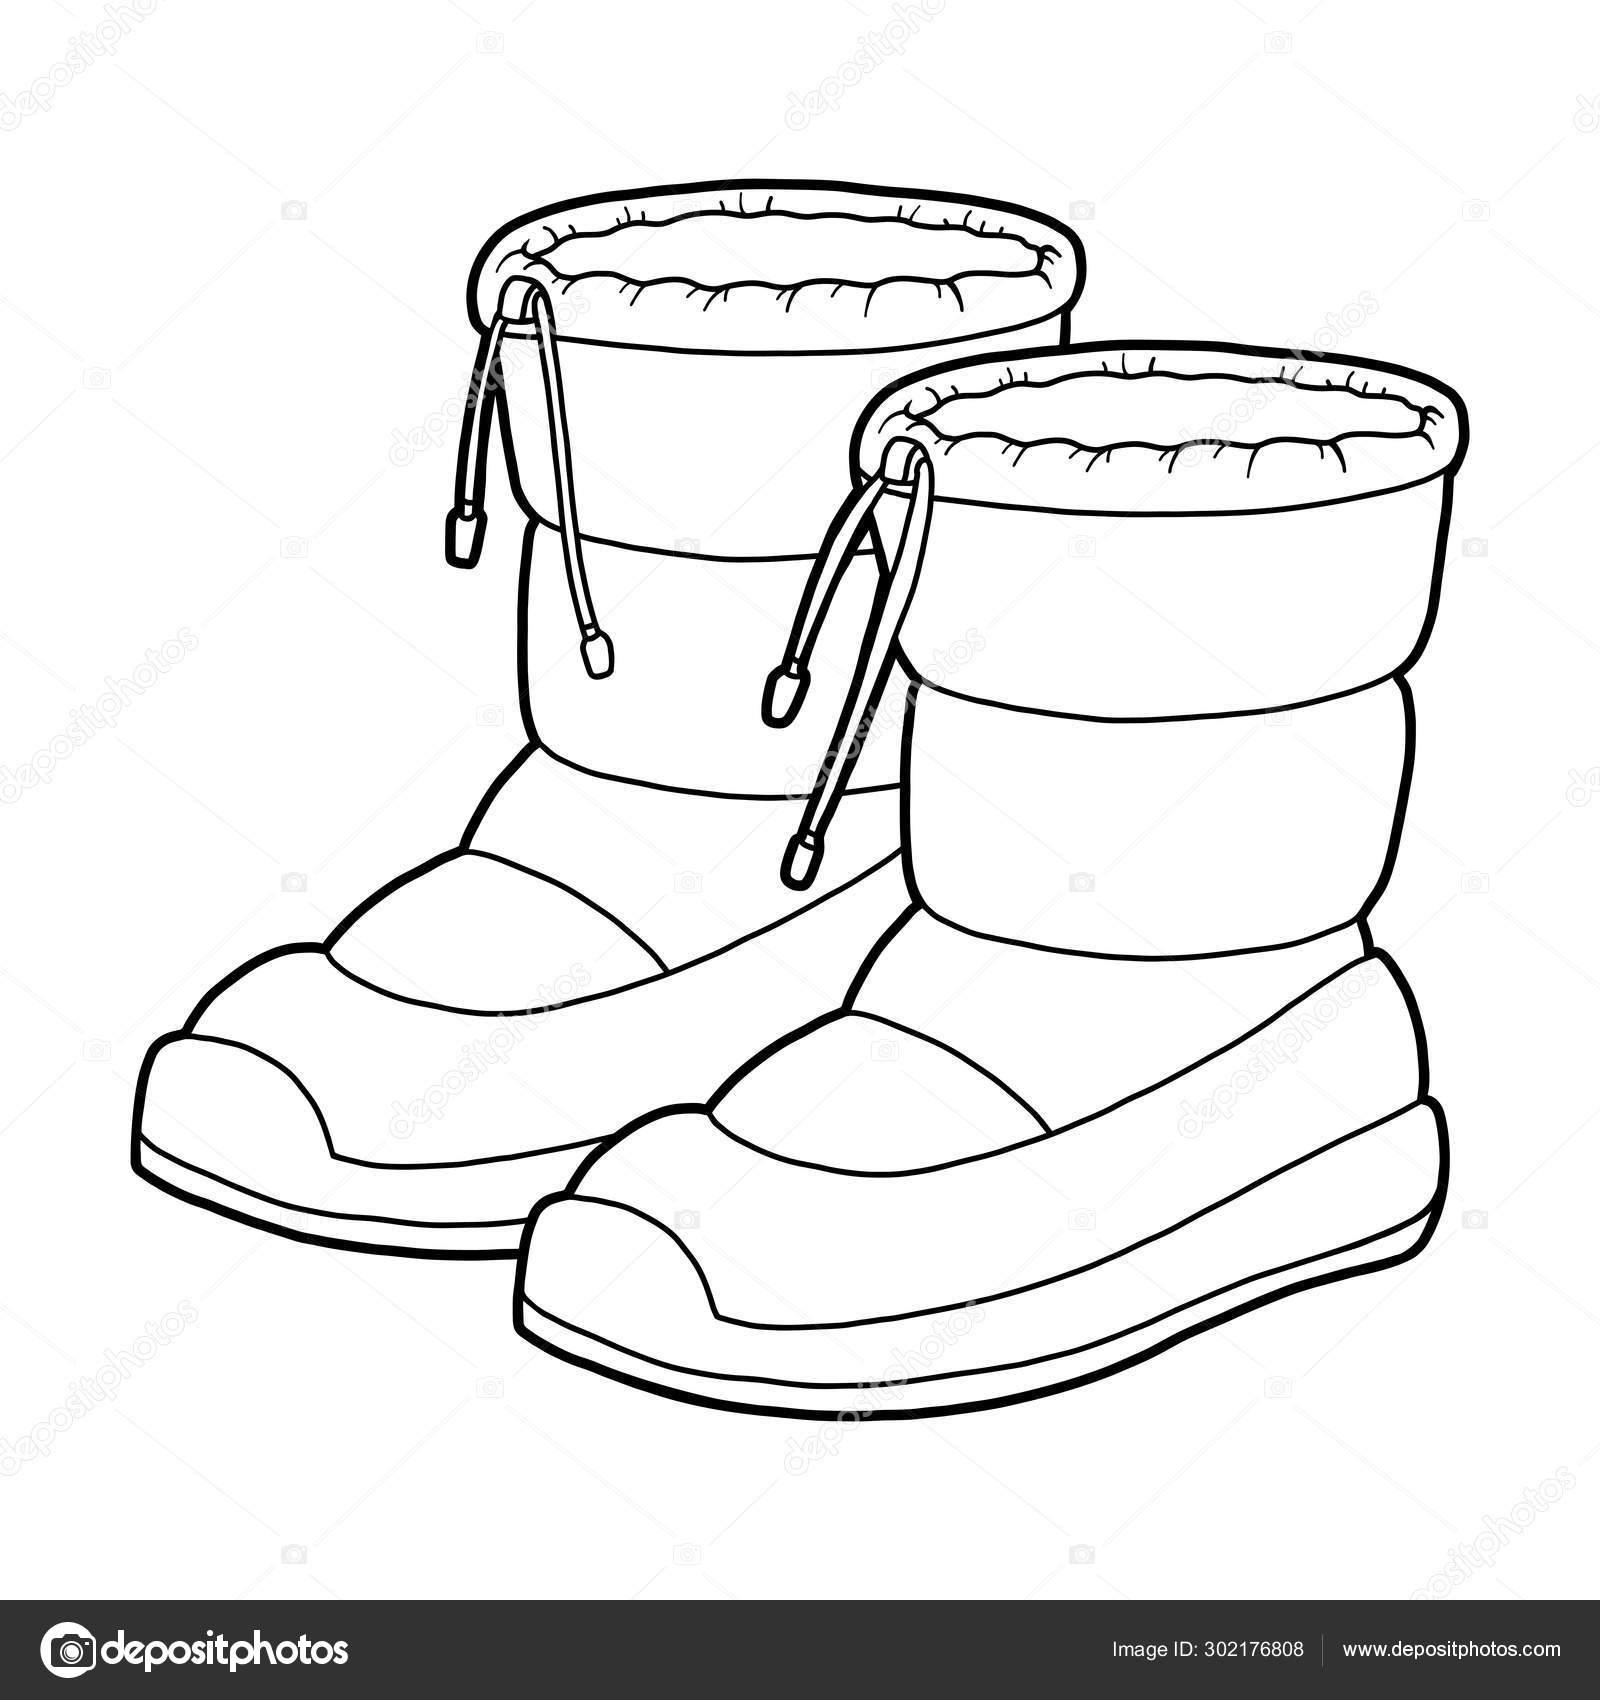 Coloring book, cartoon shoe collection. Waterproof snow